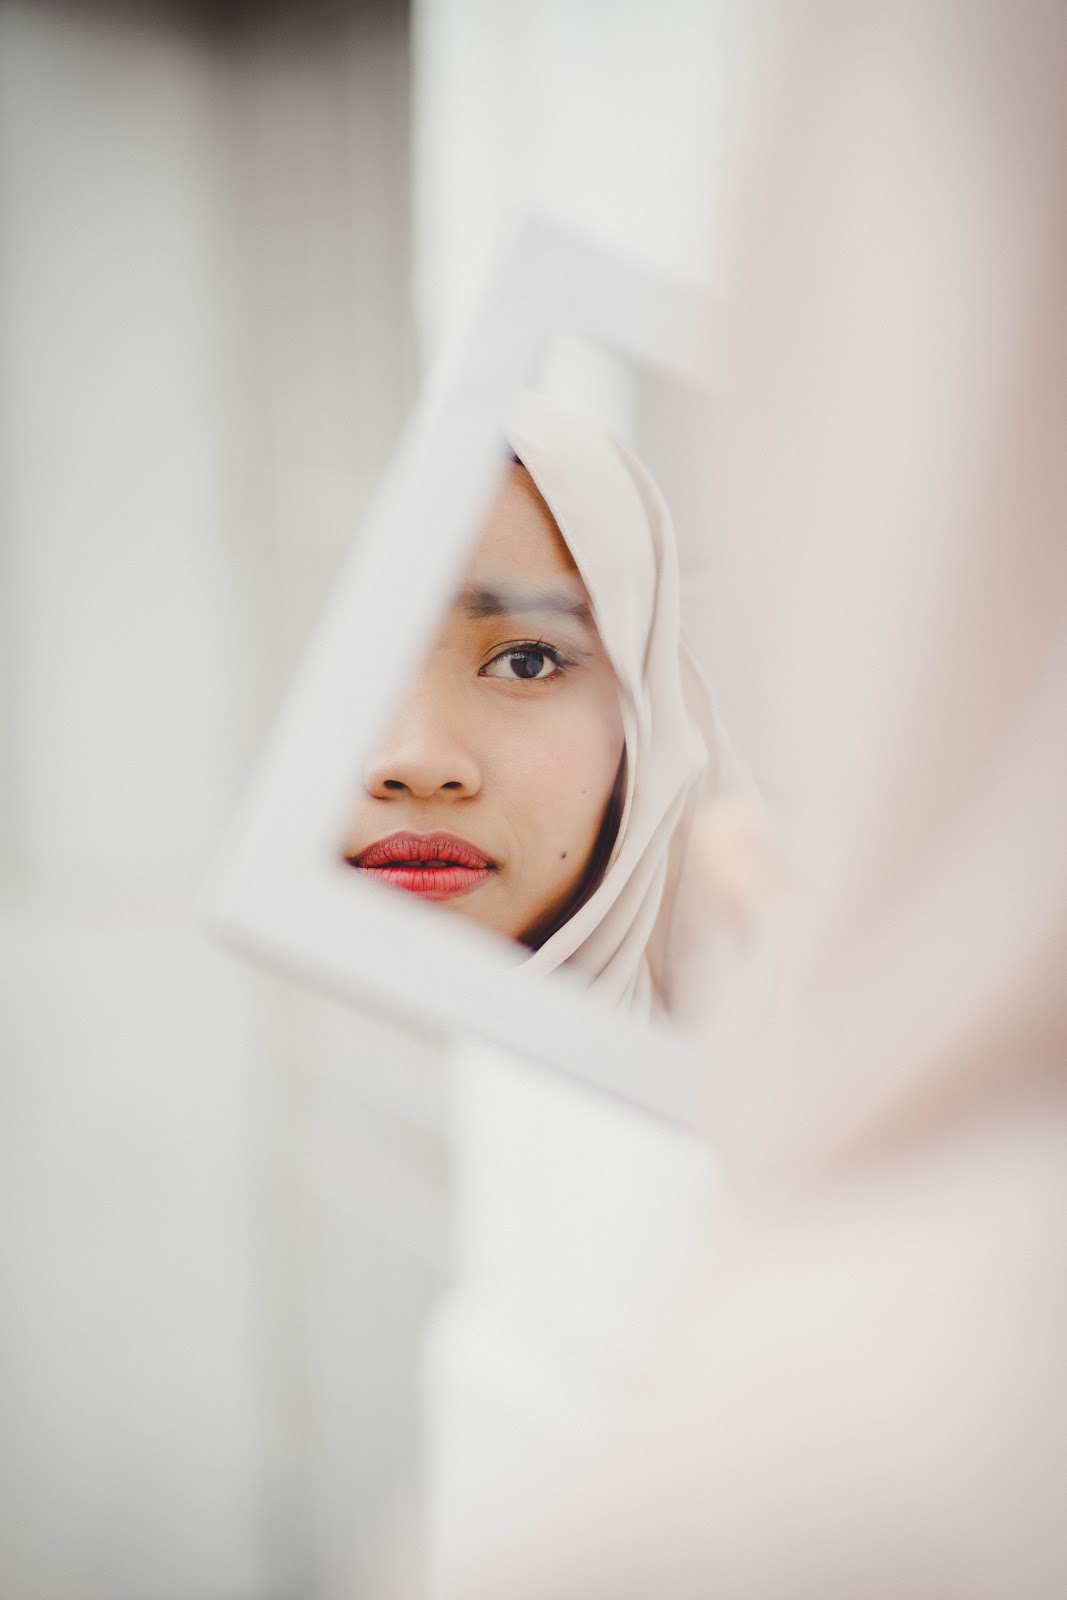 10 Creative Self Portrait Techniques That Will Inspire You